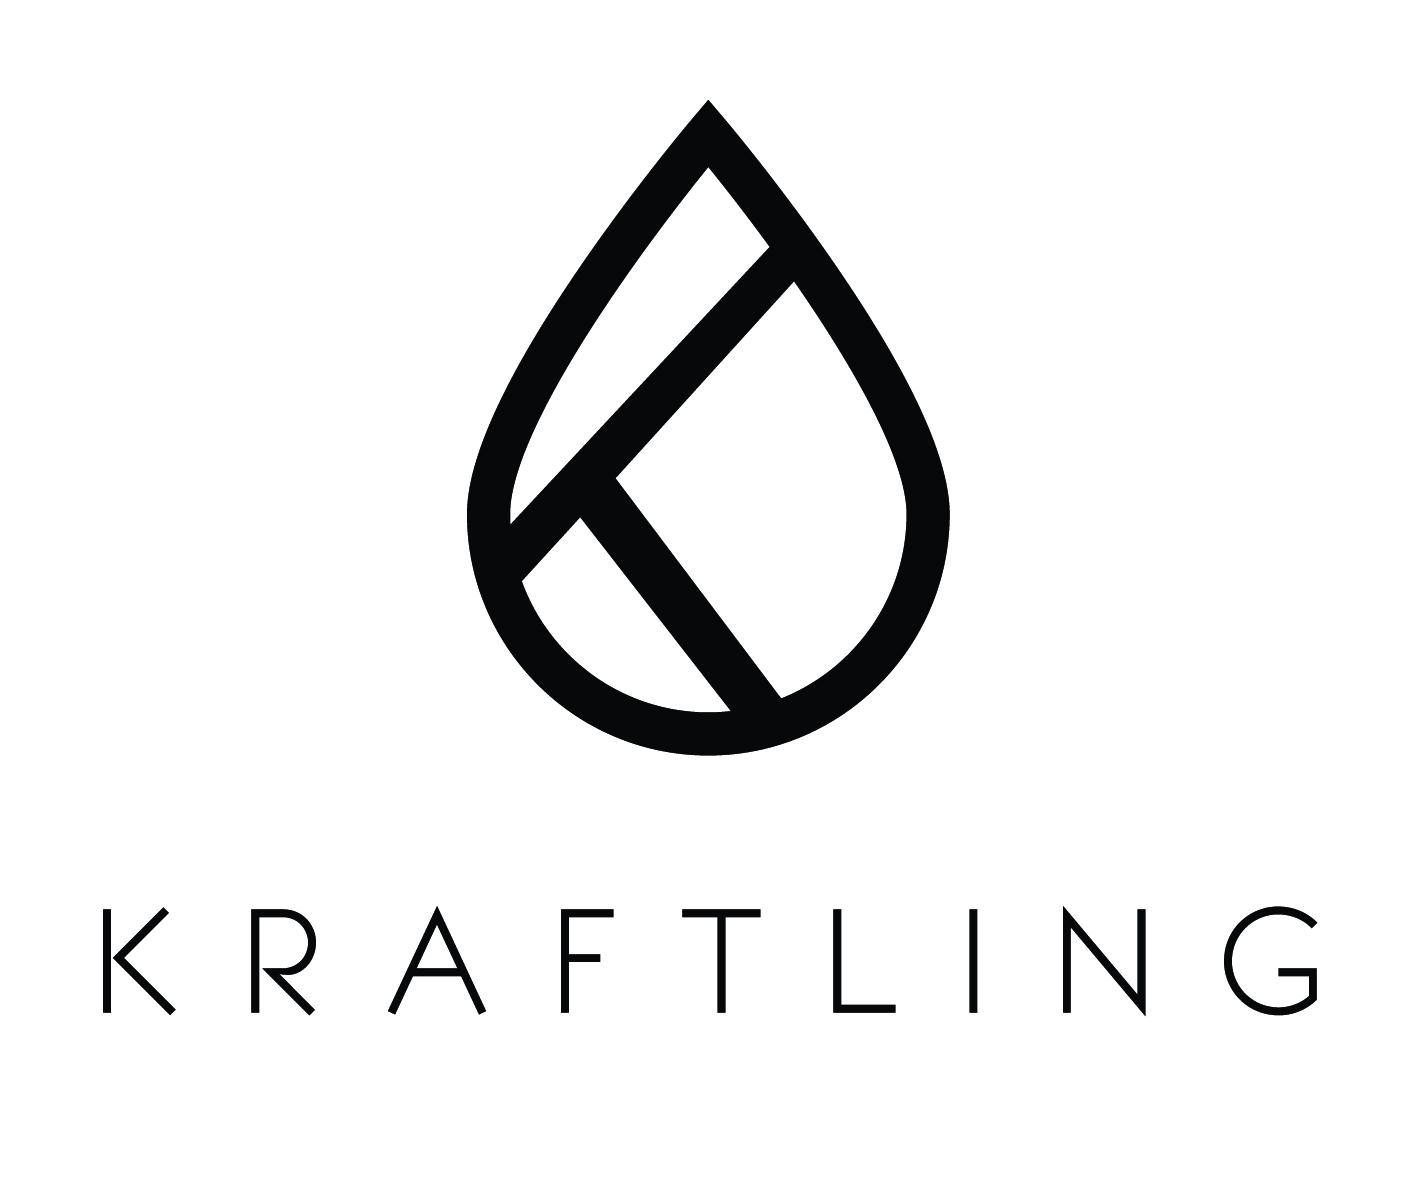 Kraftling